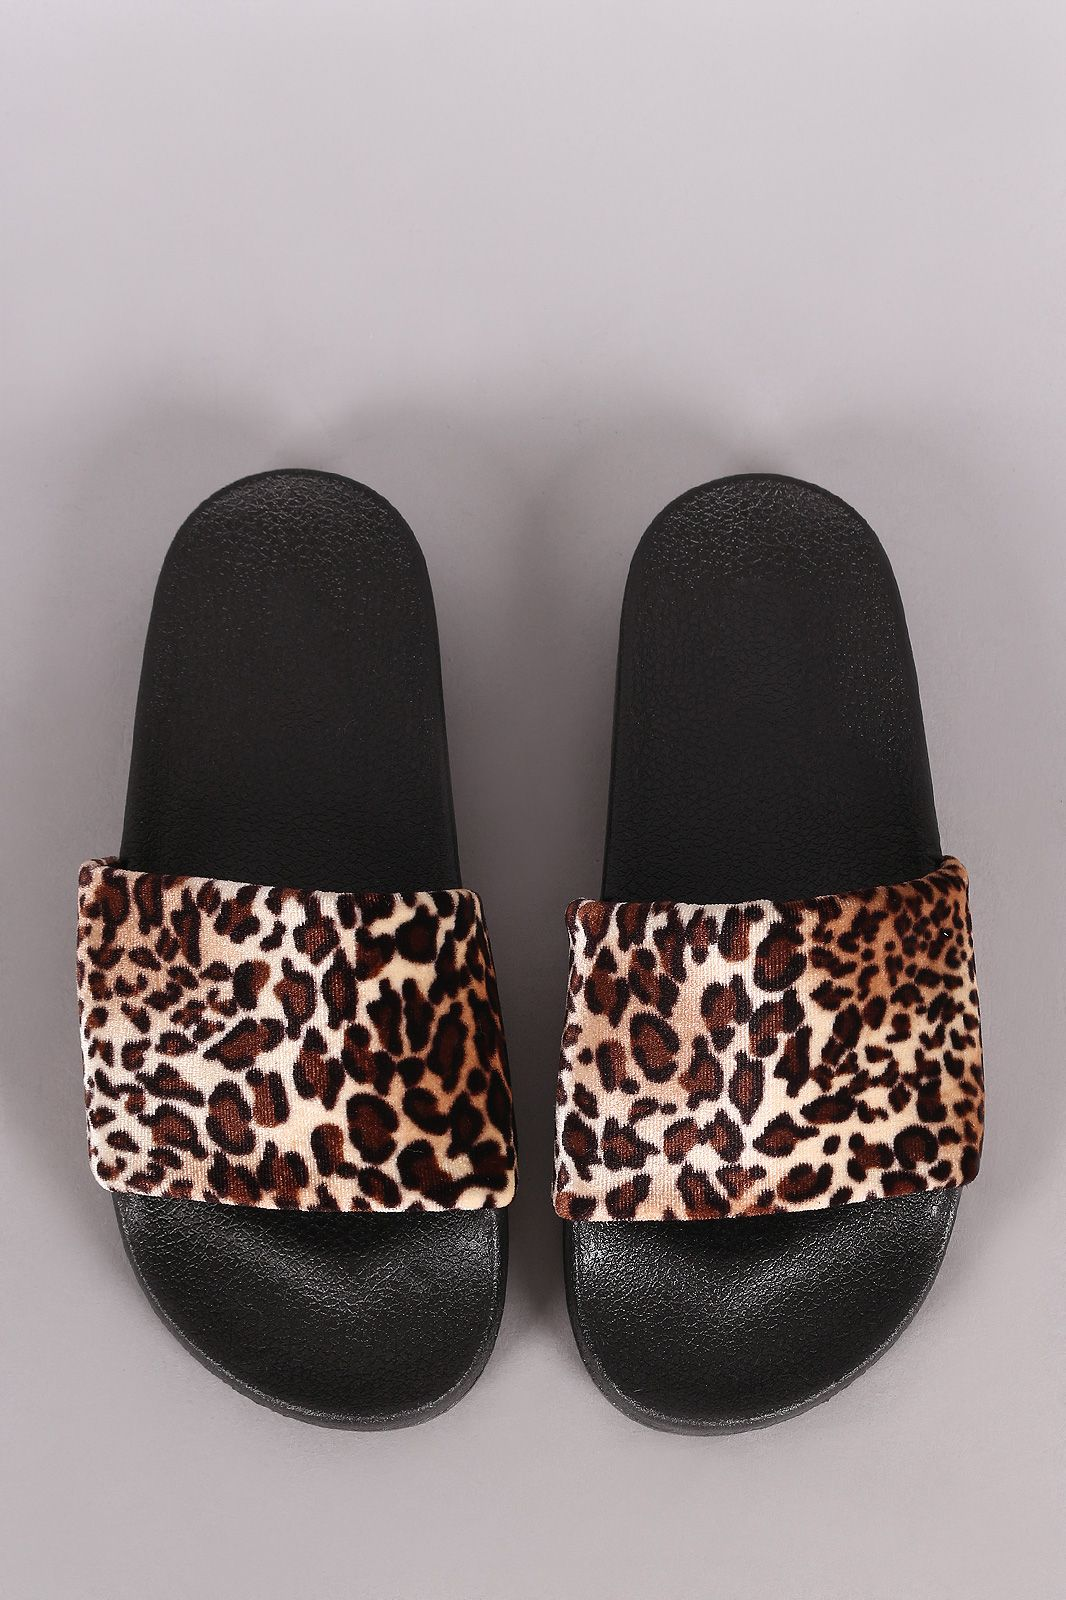 Sandals, Leopard print sandals, Open toe